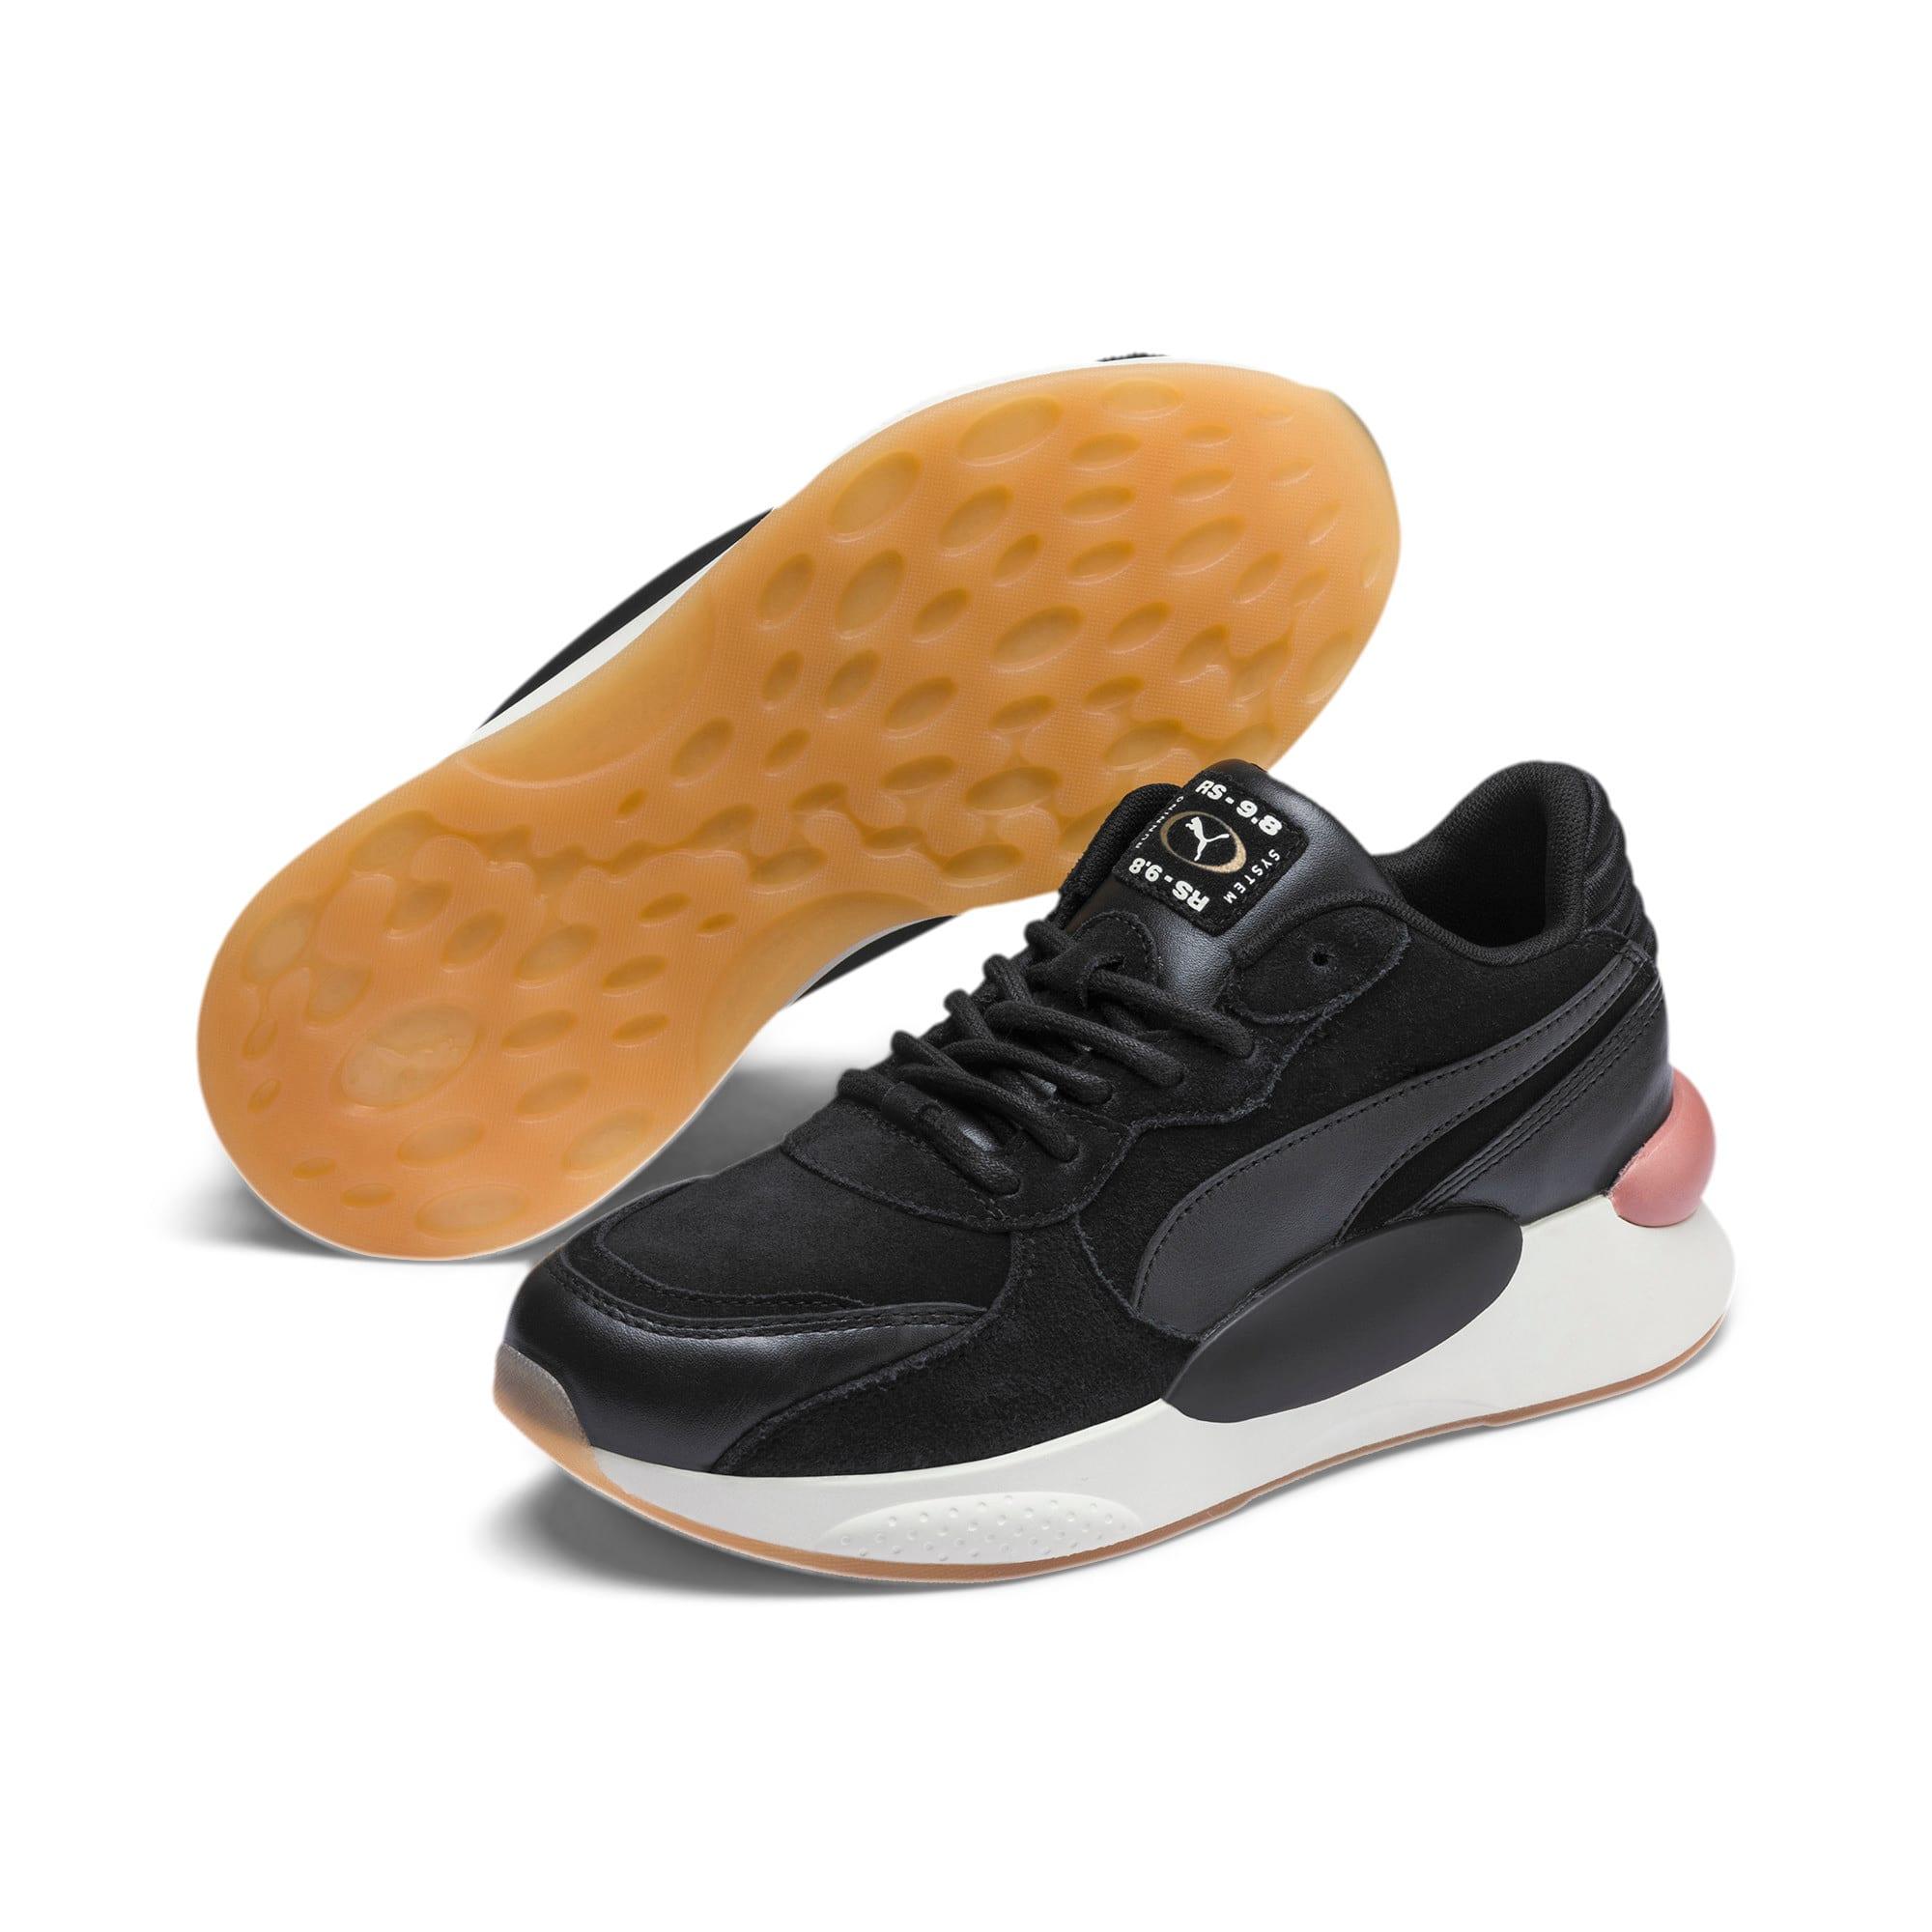 Thumbnail 3 of RS 9.8 Metallic Women's Sneakers, Puma Black Heather, medium